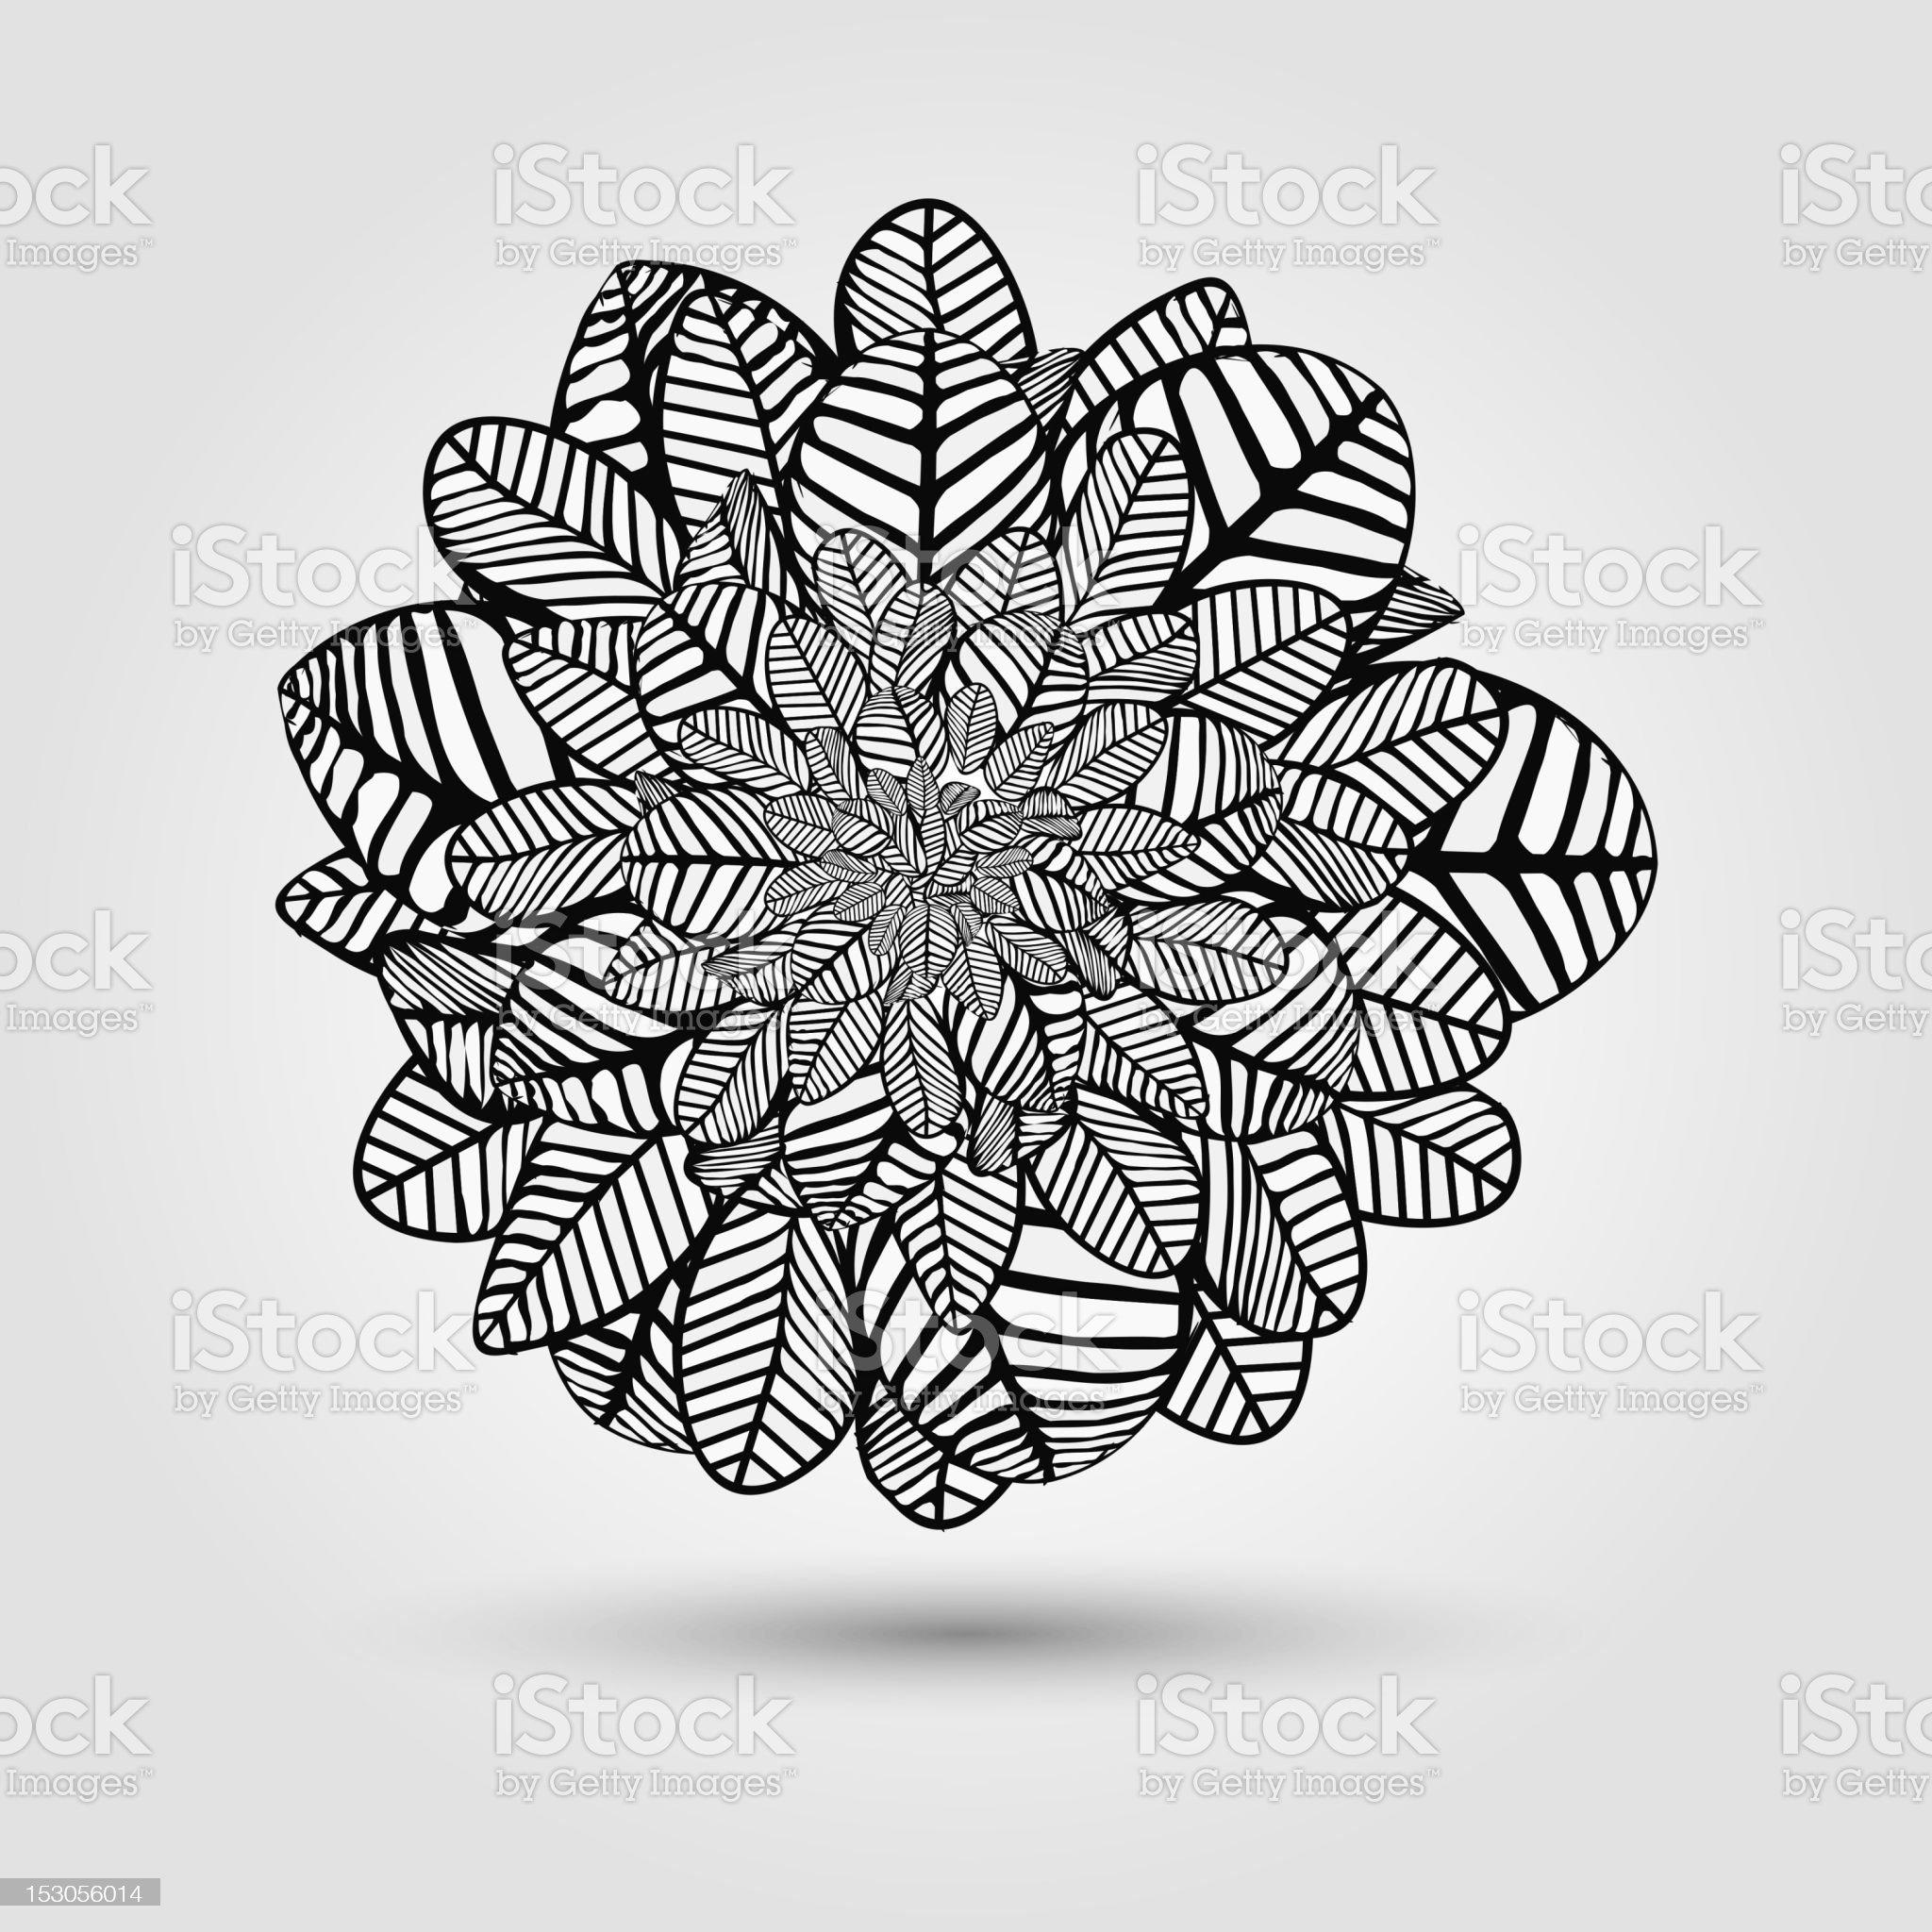 leaf pattern for design royalty-free stock vector art